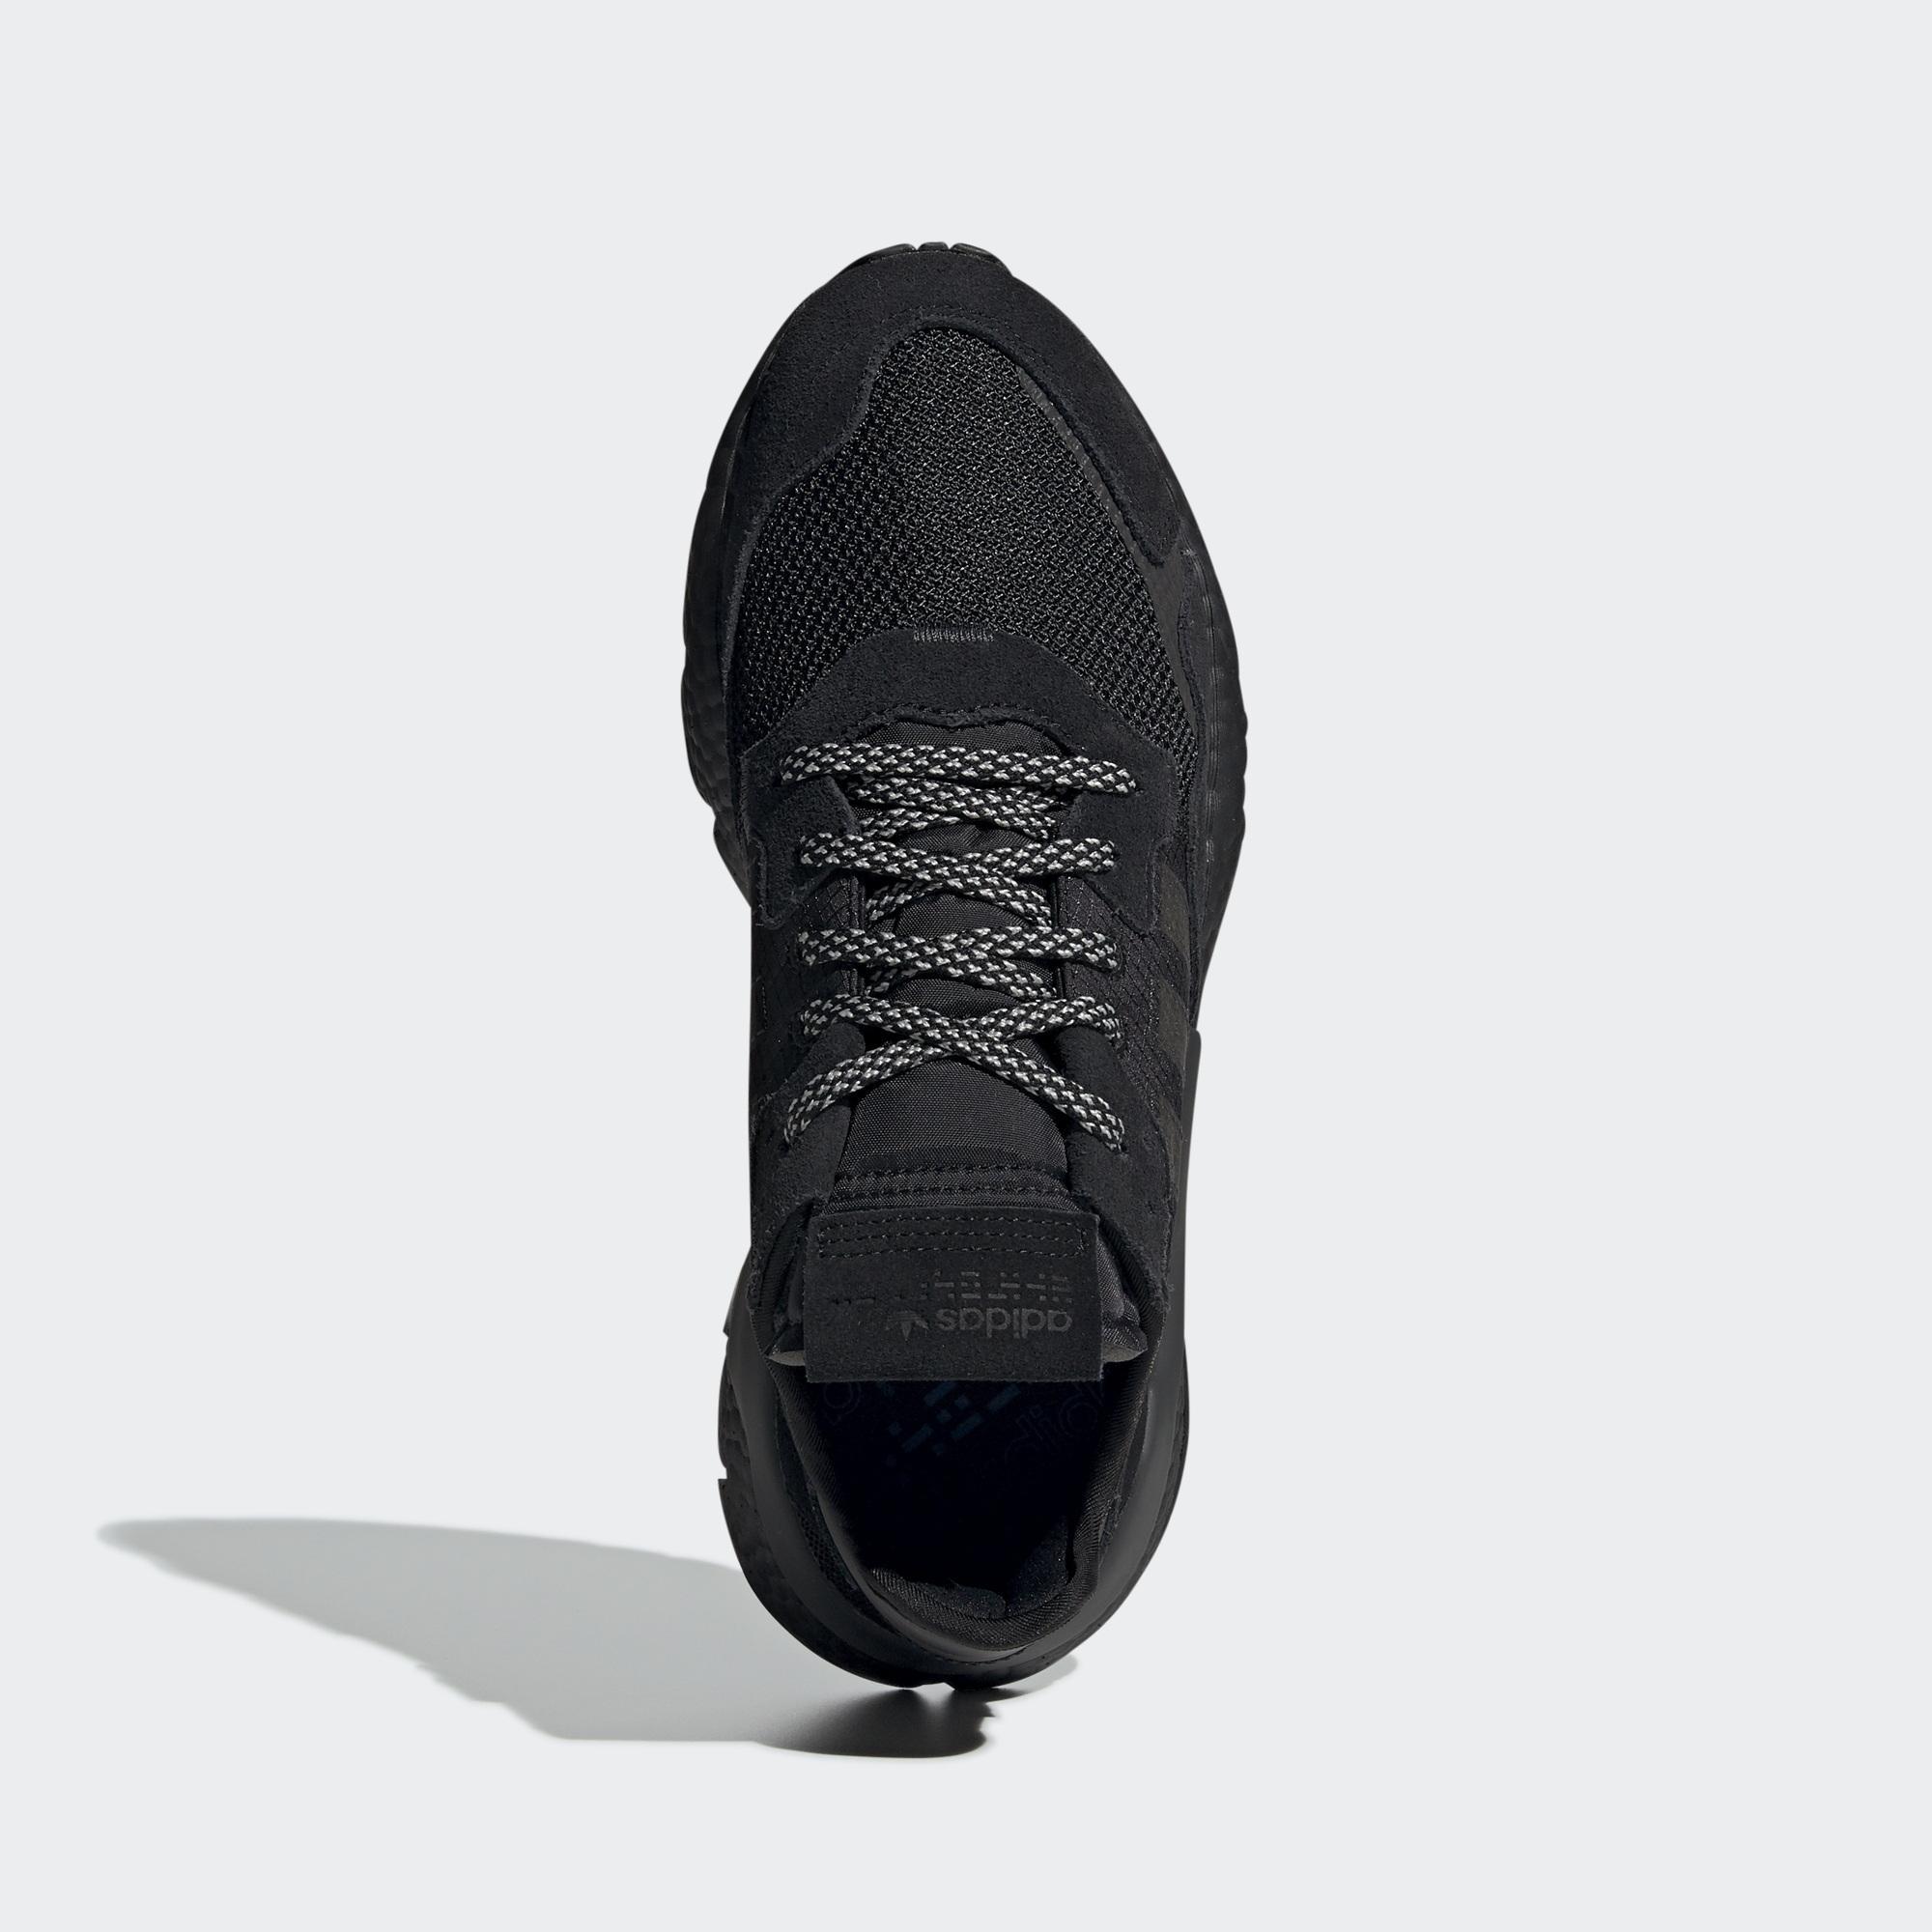 【ADIDAS】 NITE JOGGER 休閒鞋 慢跑鞋 男 訂價5290 BD7954 (Palace store) 4